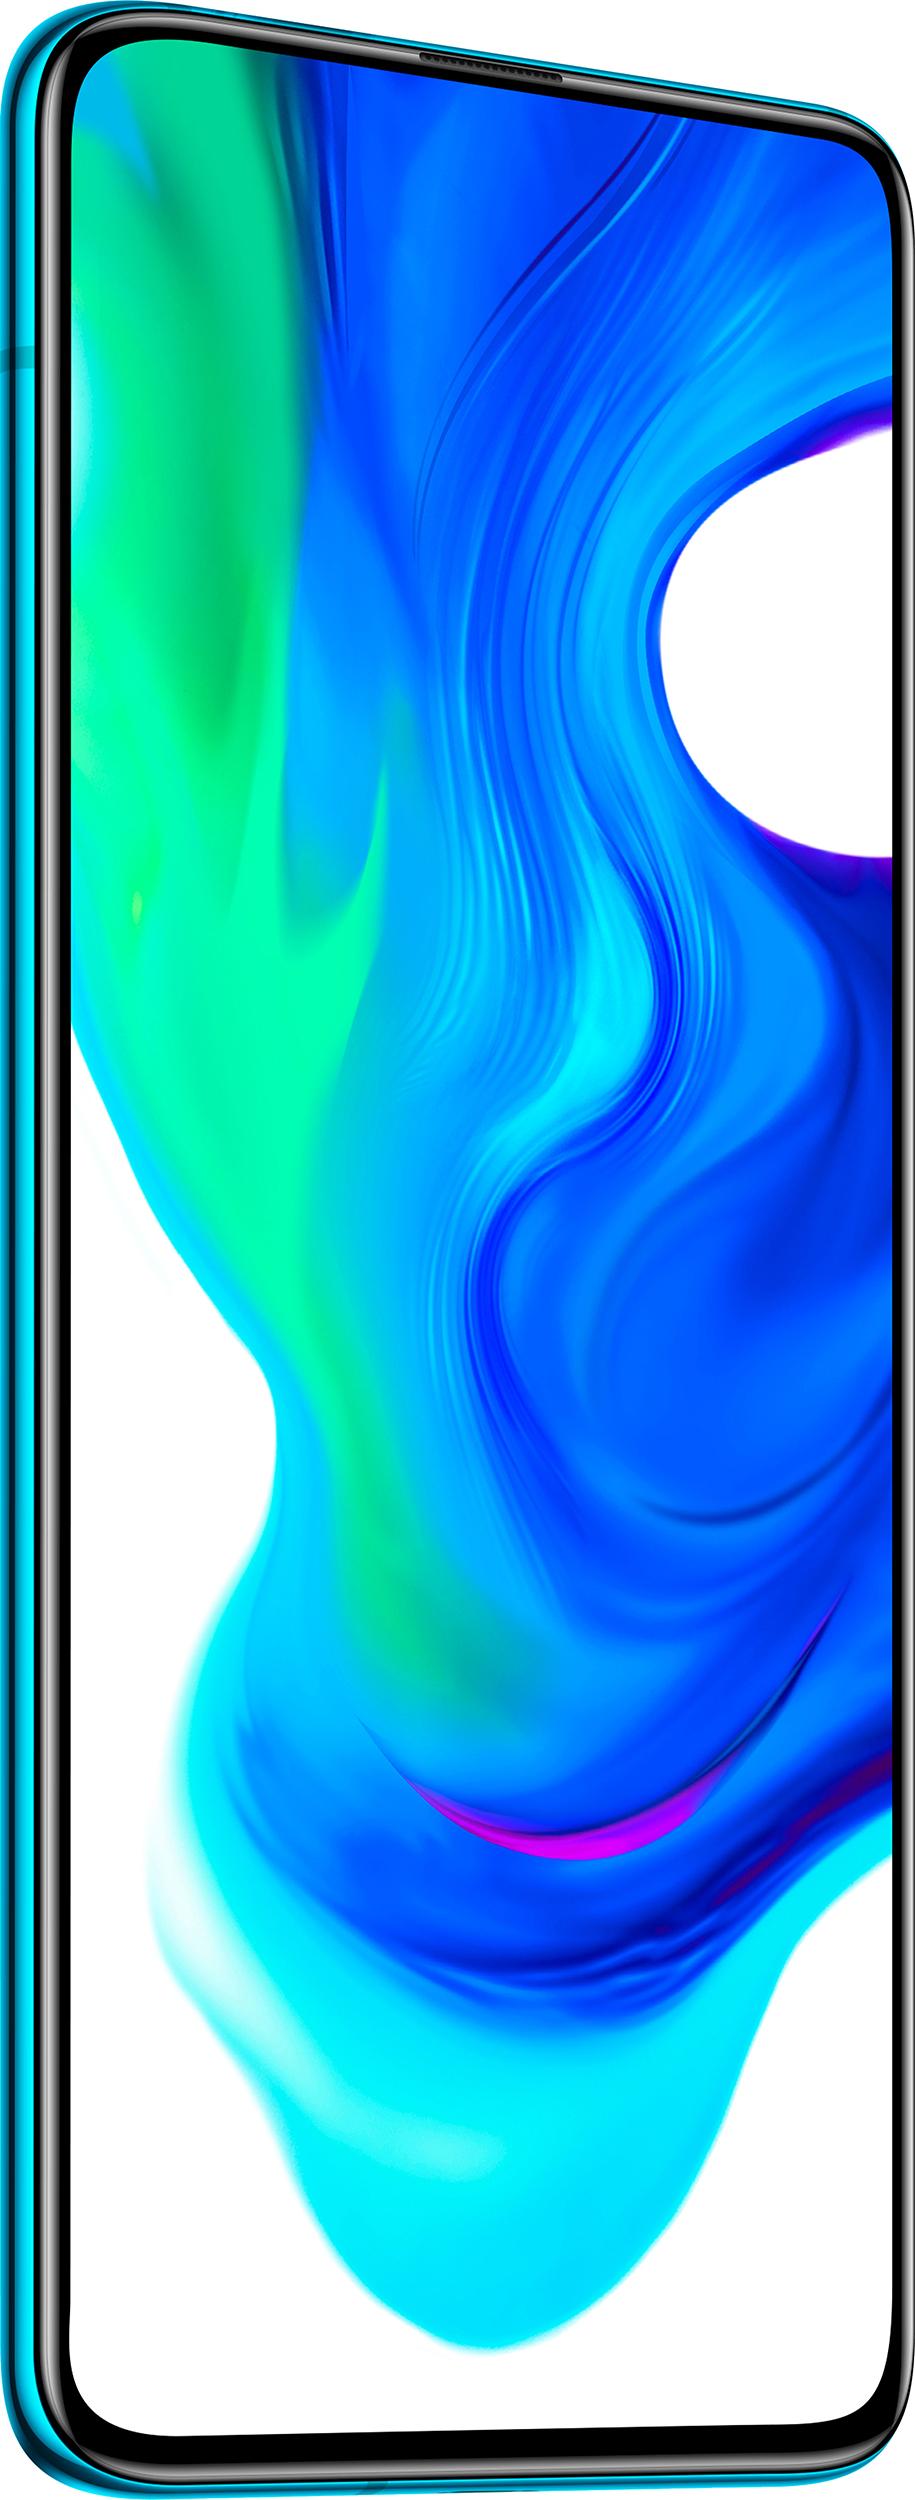 POCO F2 Pro okostelefon 6+128GB, Neon Blue